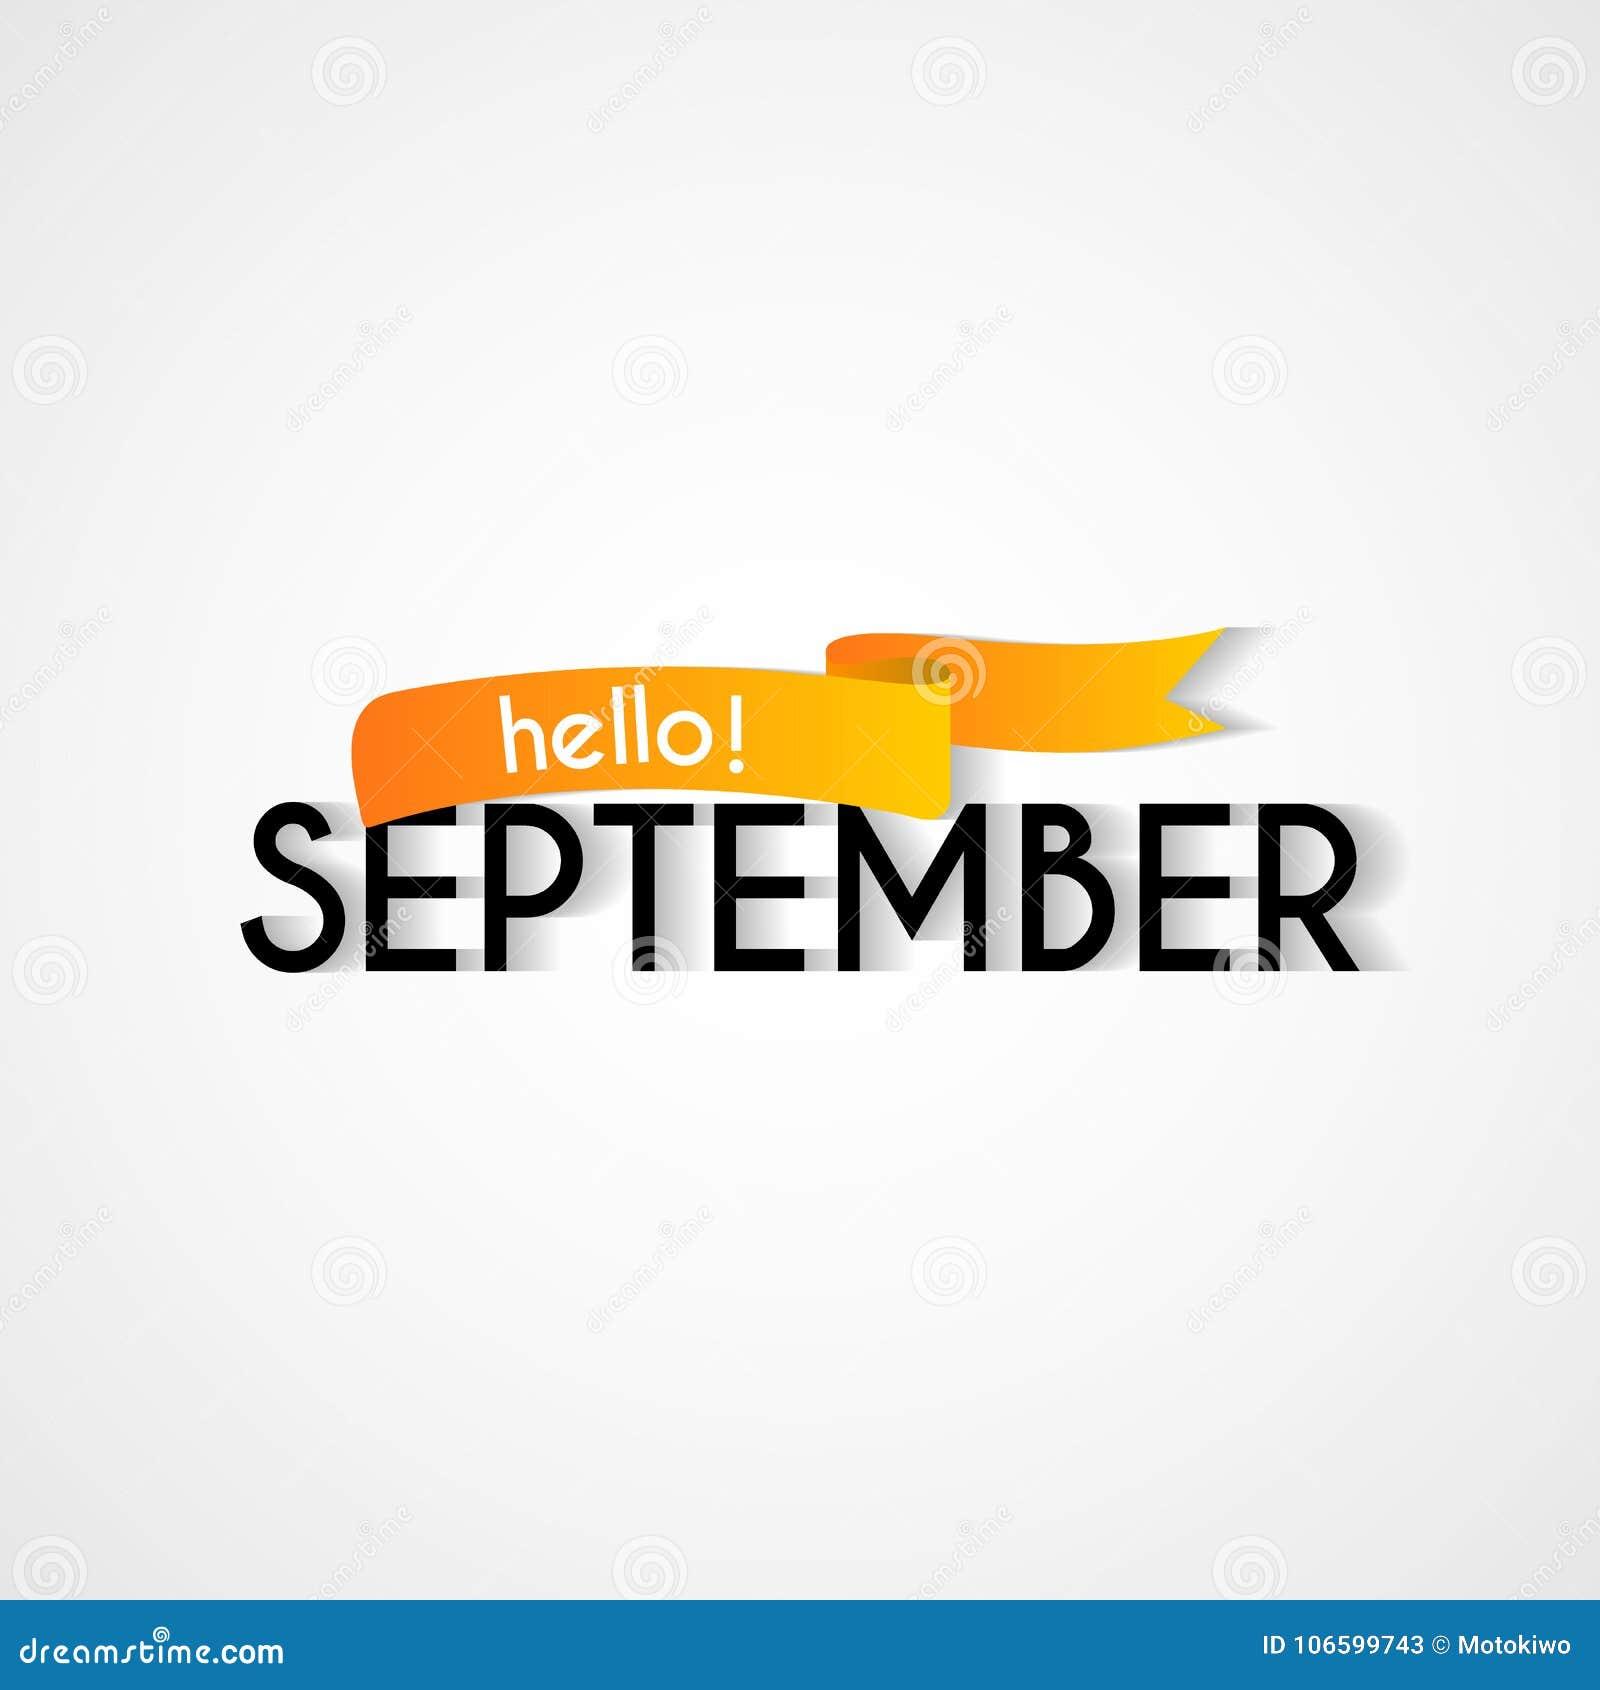 Happy new month september background design stock illustration happy new month september background design m4hsunfo